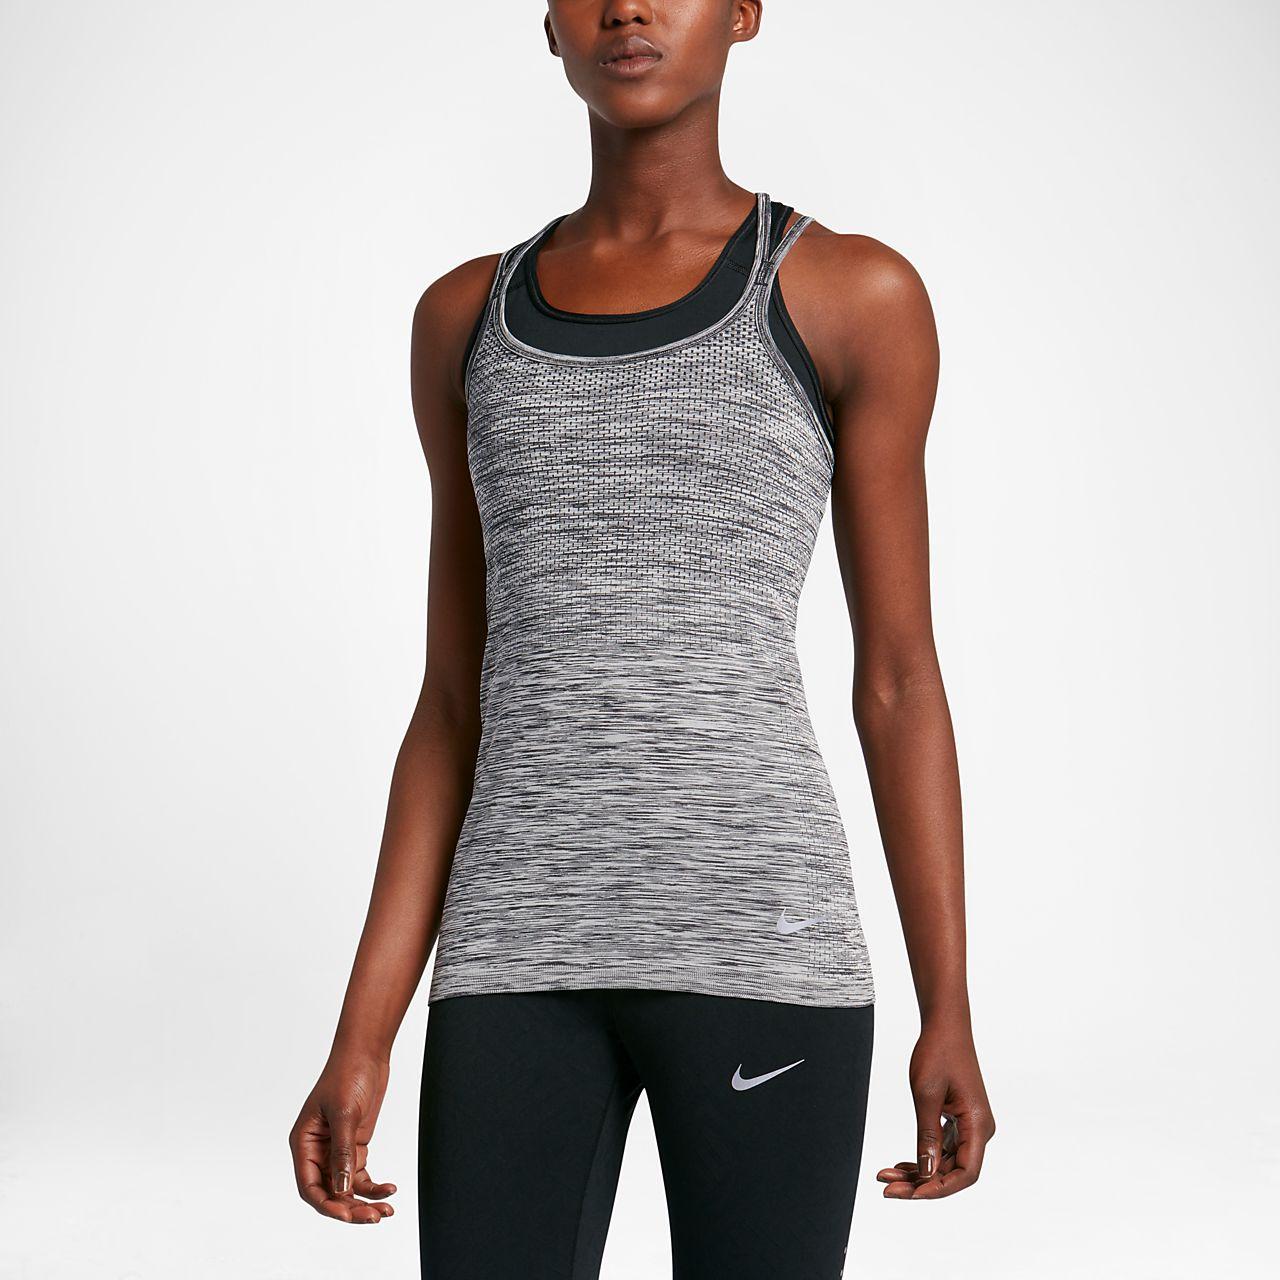 cba9669a72234 Nike Dri-FIT Knit Women s Running Tank. Nike.com AU